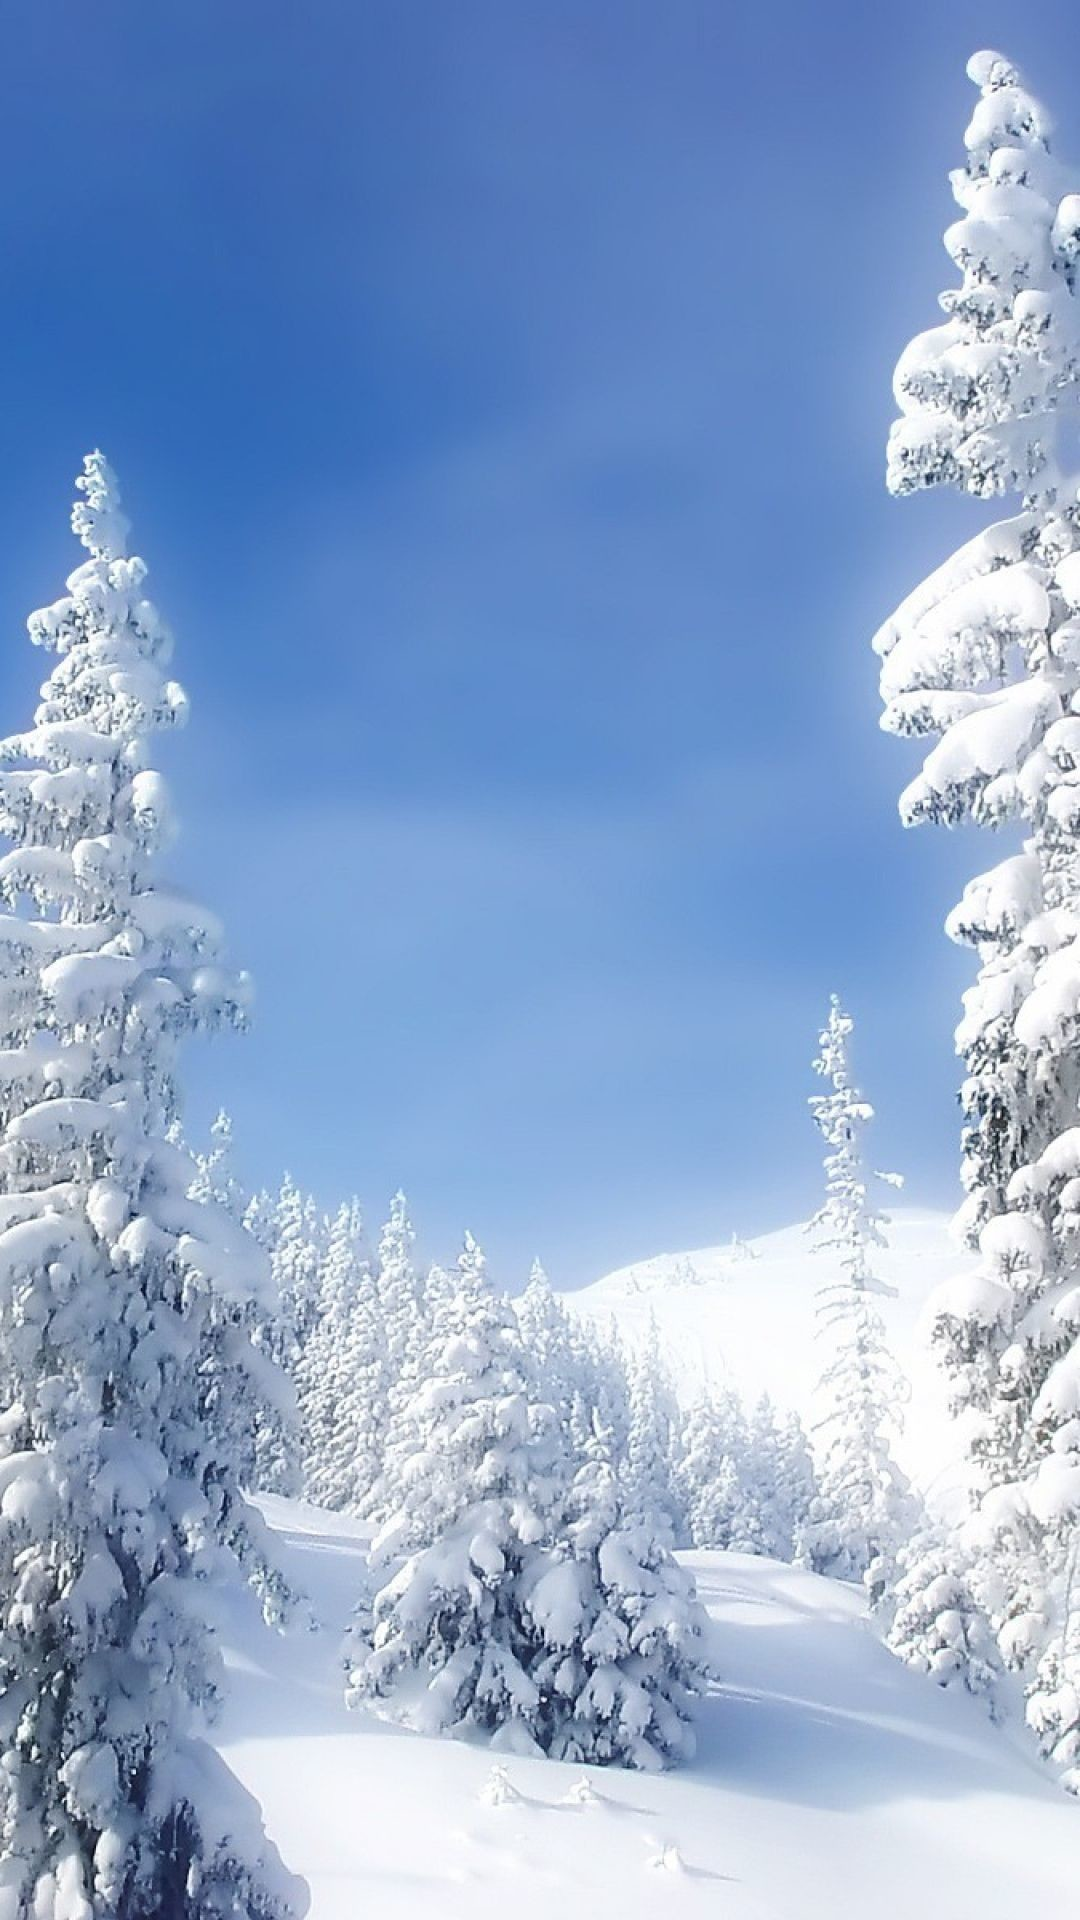 Res: 1080x1920, Winter landscapes live wallpaper for Android. Winter landscapes   Epic Car  Wallpapers   Pinterest   Winter landscape and Landscaping